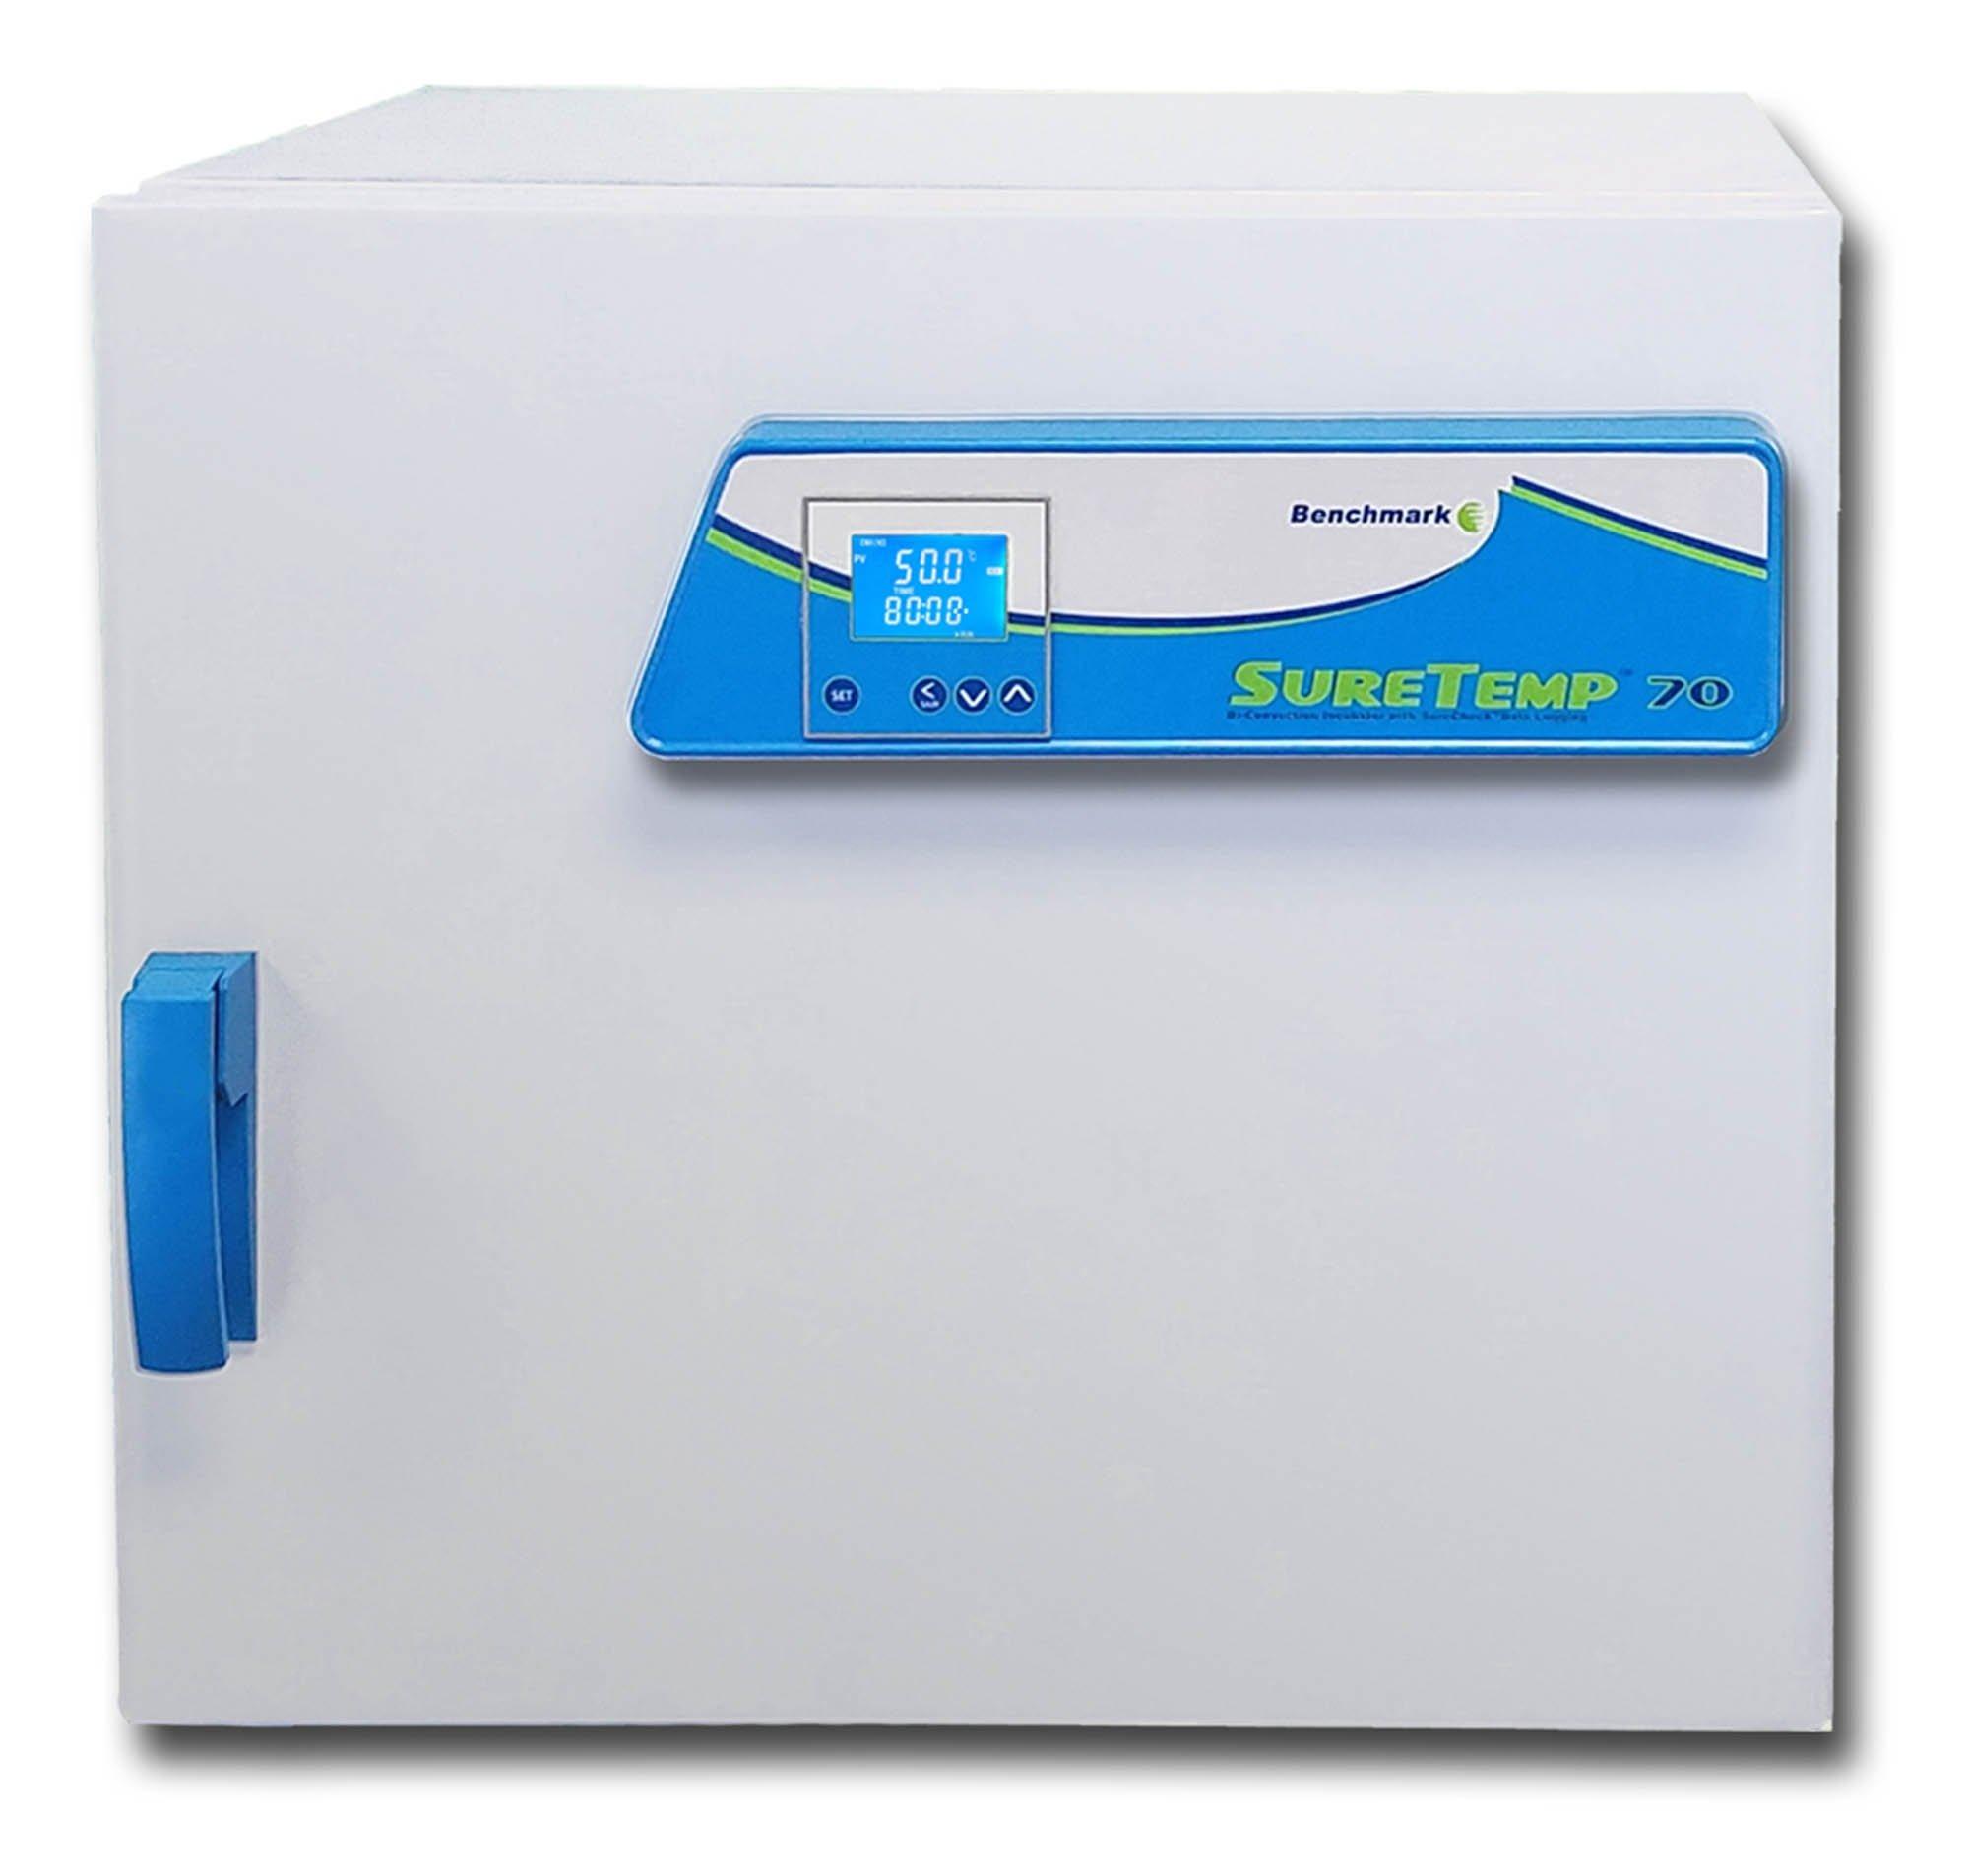 SureTemp Dual Convection Incubator, 40 Liters with SureTemp Data Logging Software (115V)